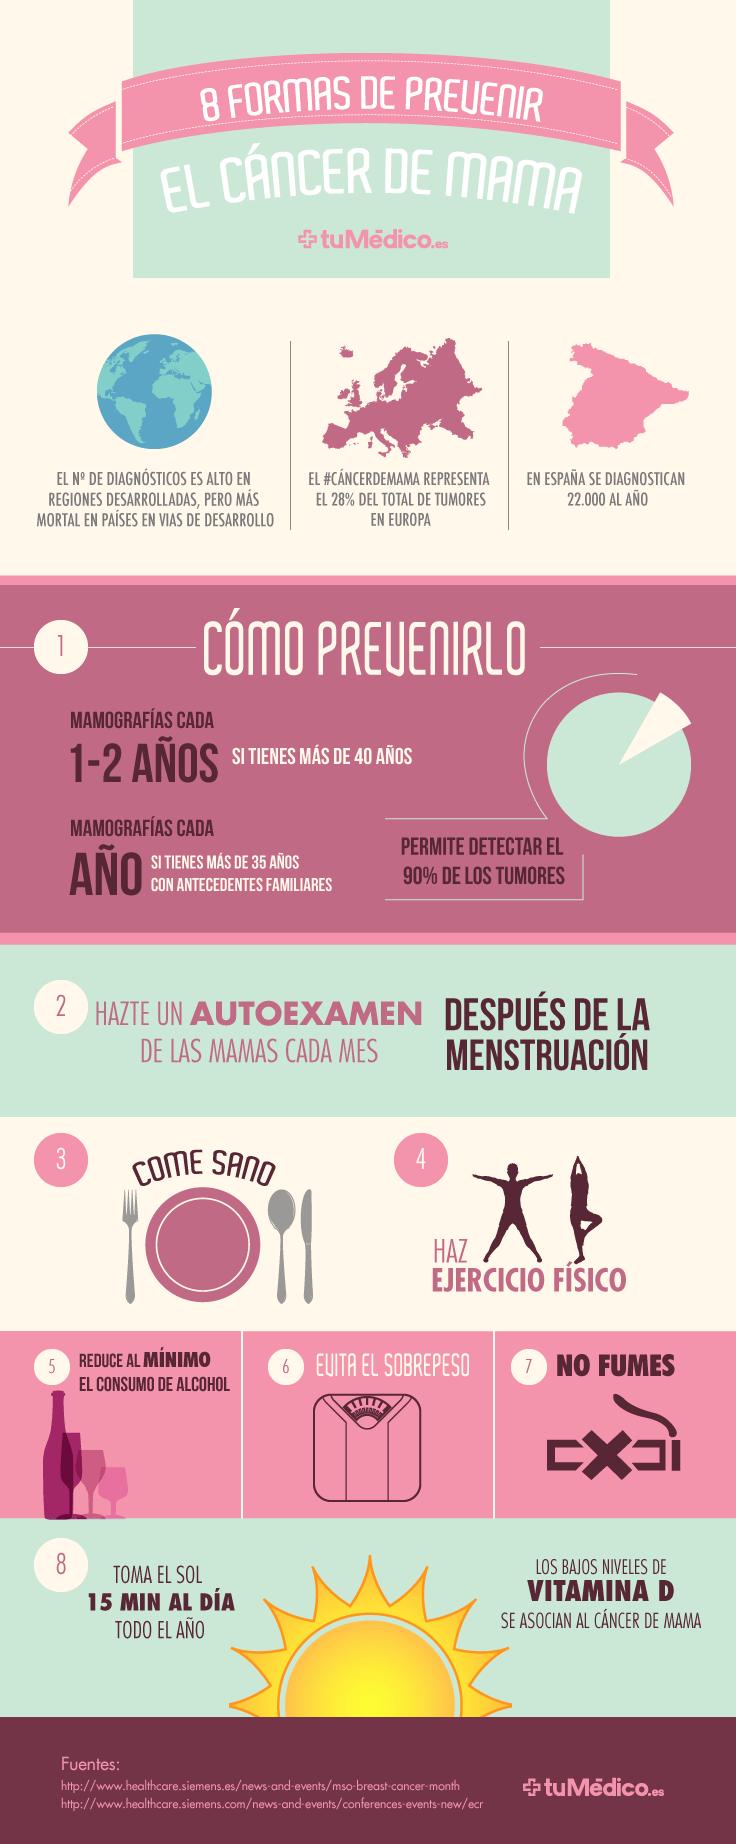 8 forma de prevenir el cáncer de mama